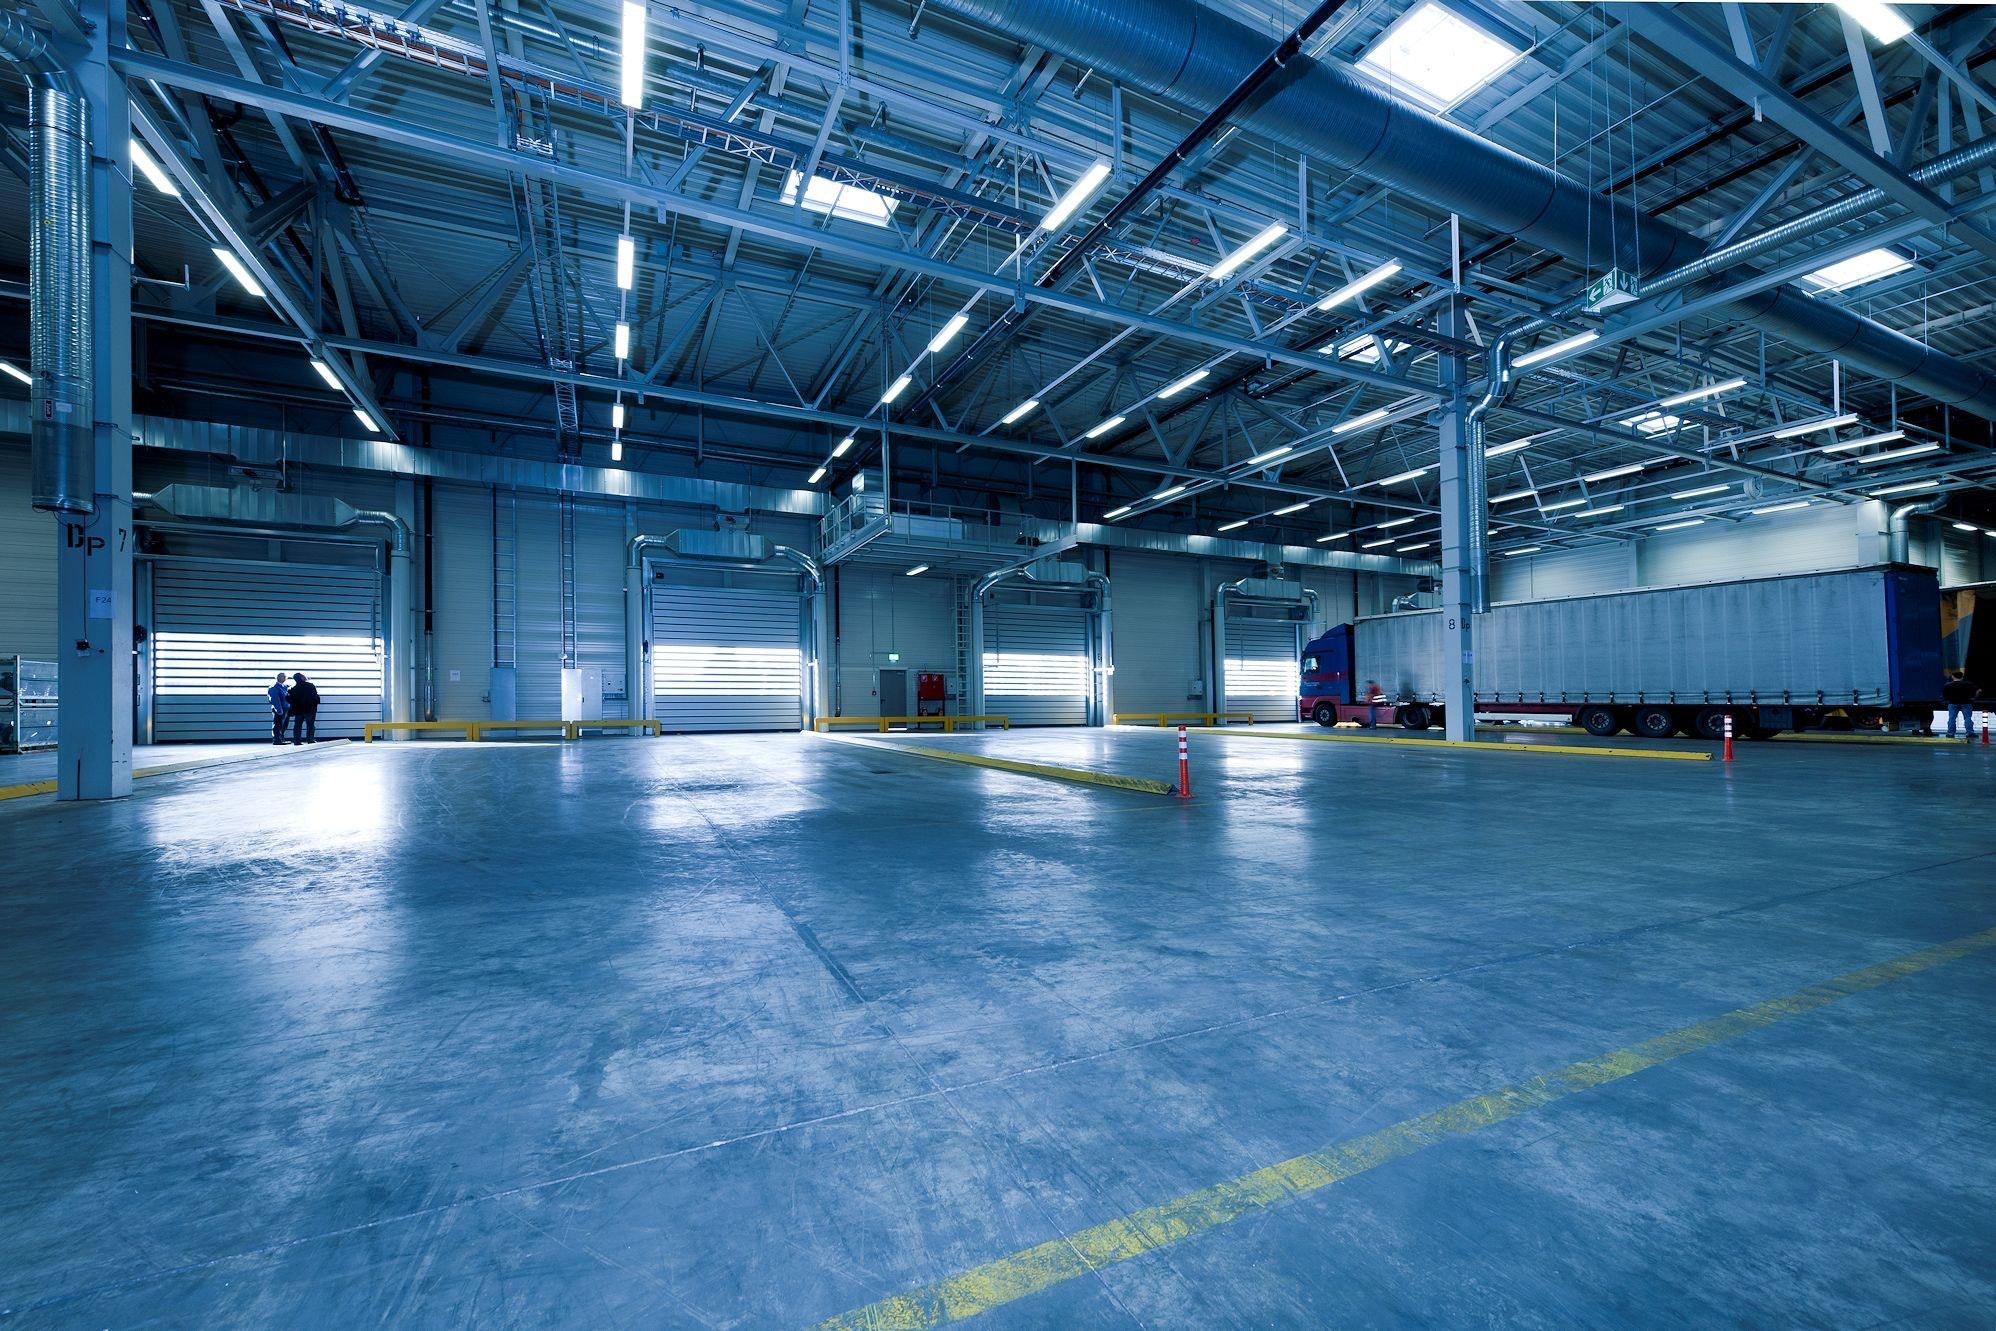 building-business-ceiling-221047.jpg